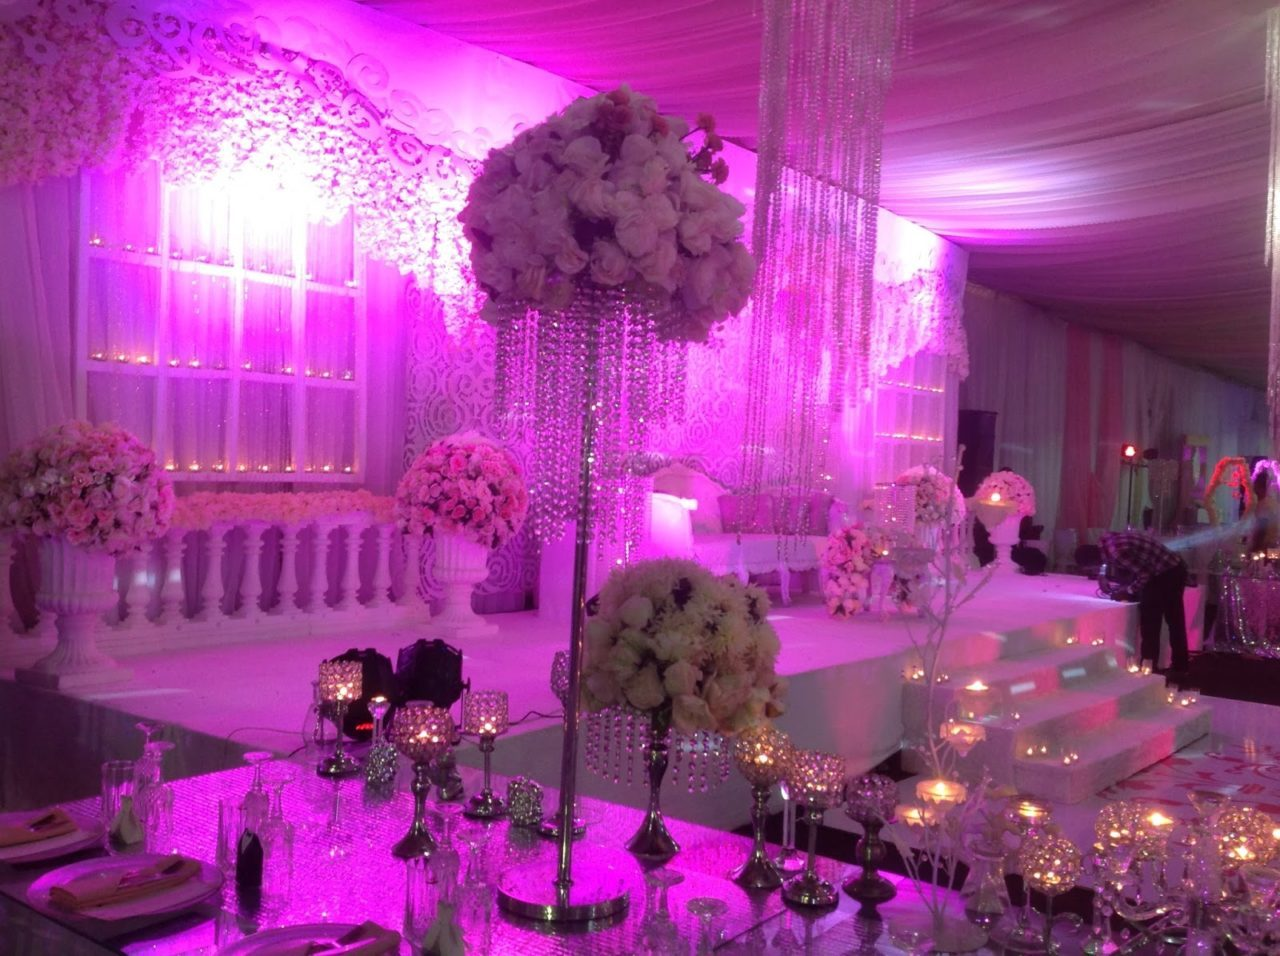 Guardian newspaper nigeria bespoke wedding decorations for the pink wedding theme photo credit pinterest junglespirit Choice Image